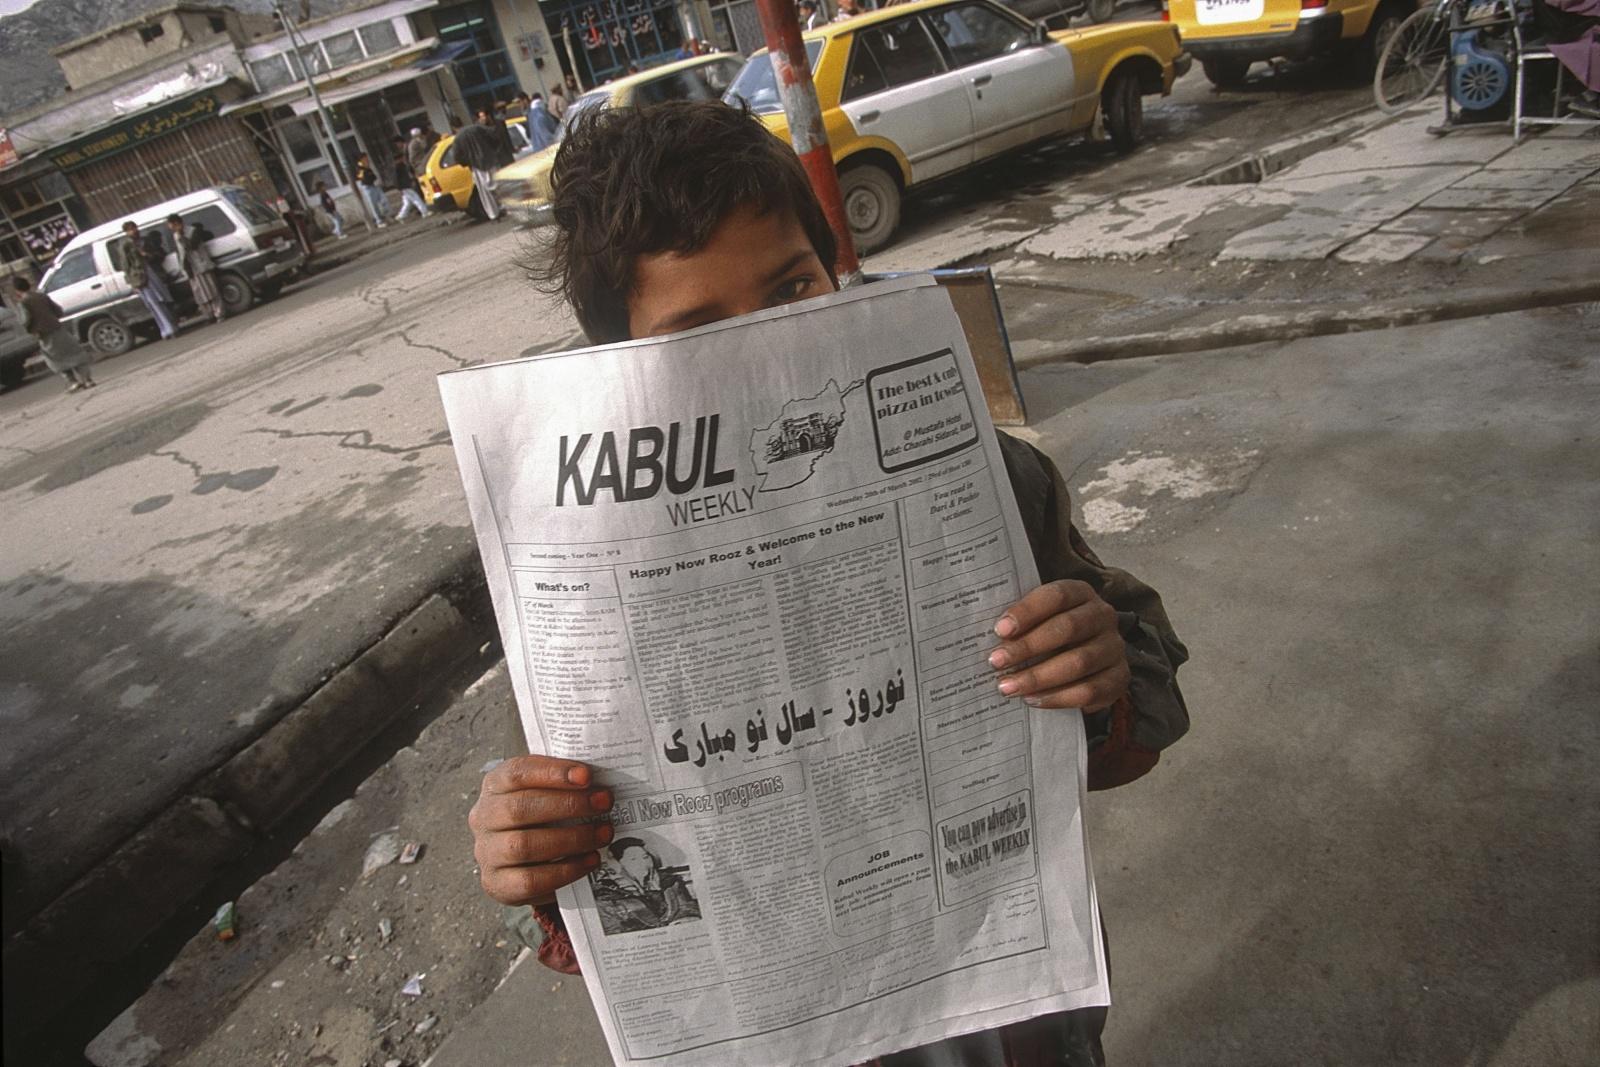 Afghanistan, Kabul-weekly unico giornale in lingua inglese